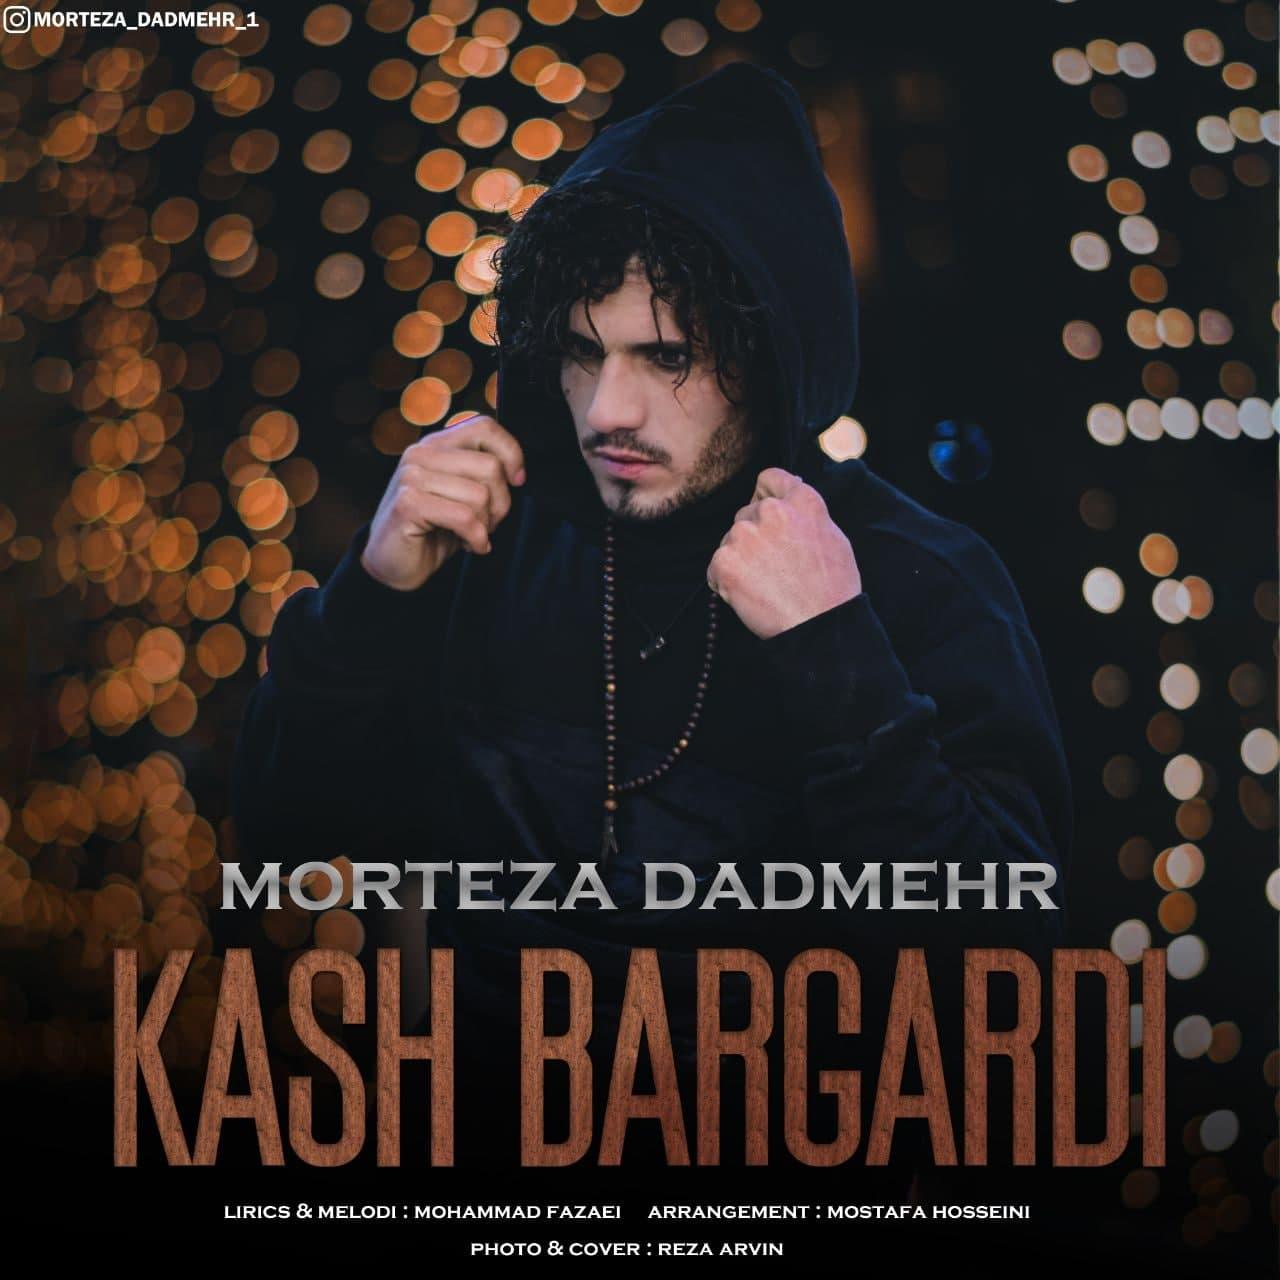 Morteza Dadmehr – Kash Bargardi